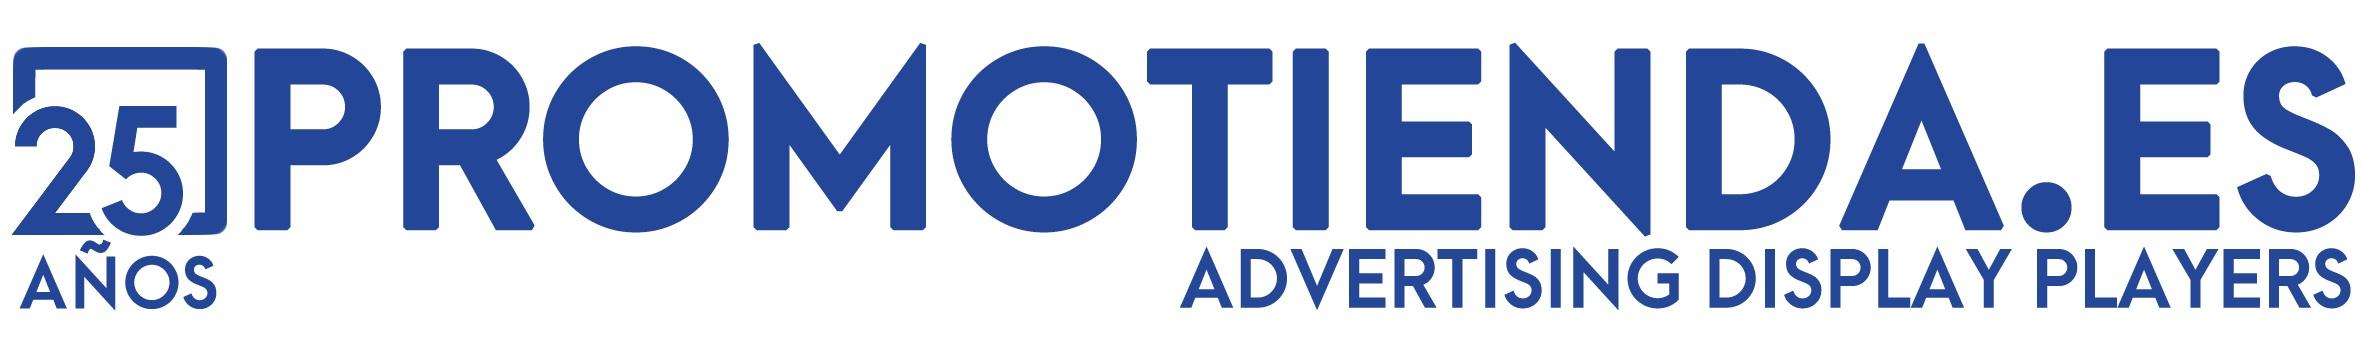 promotienda logo